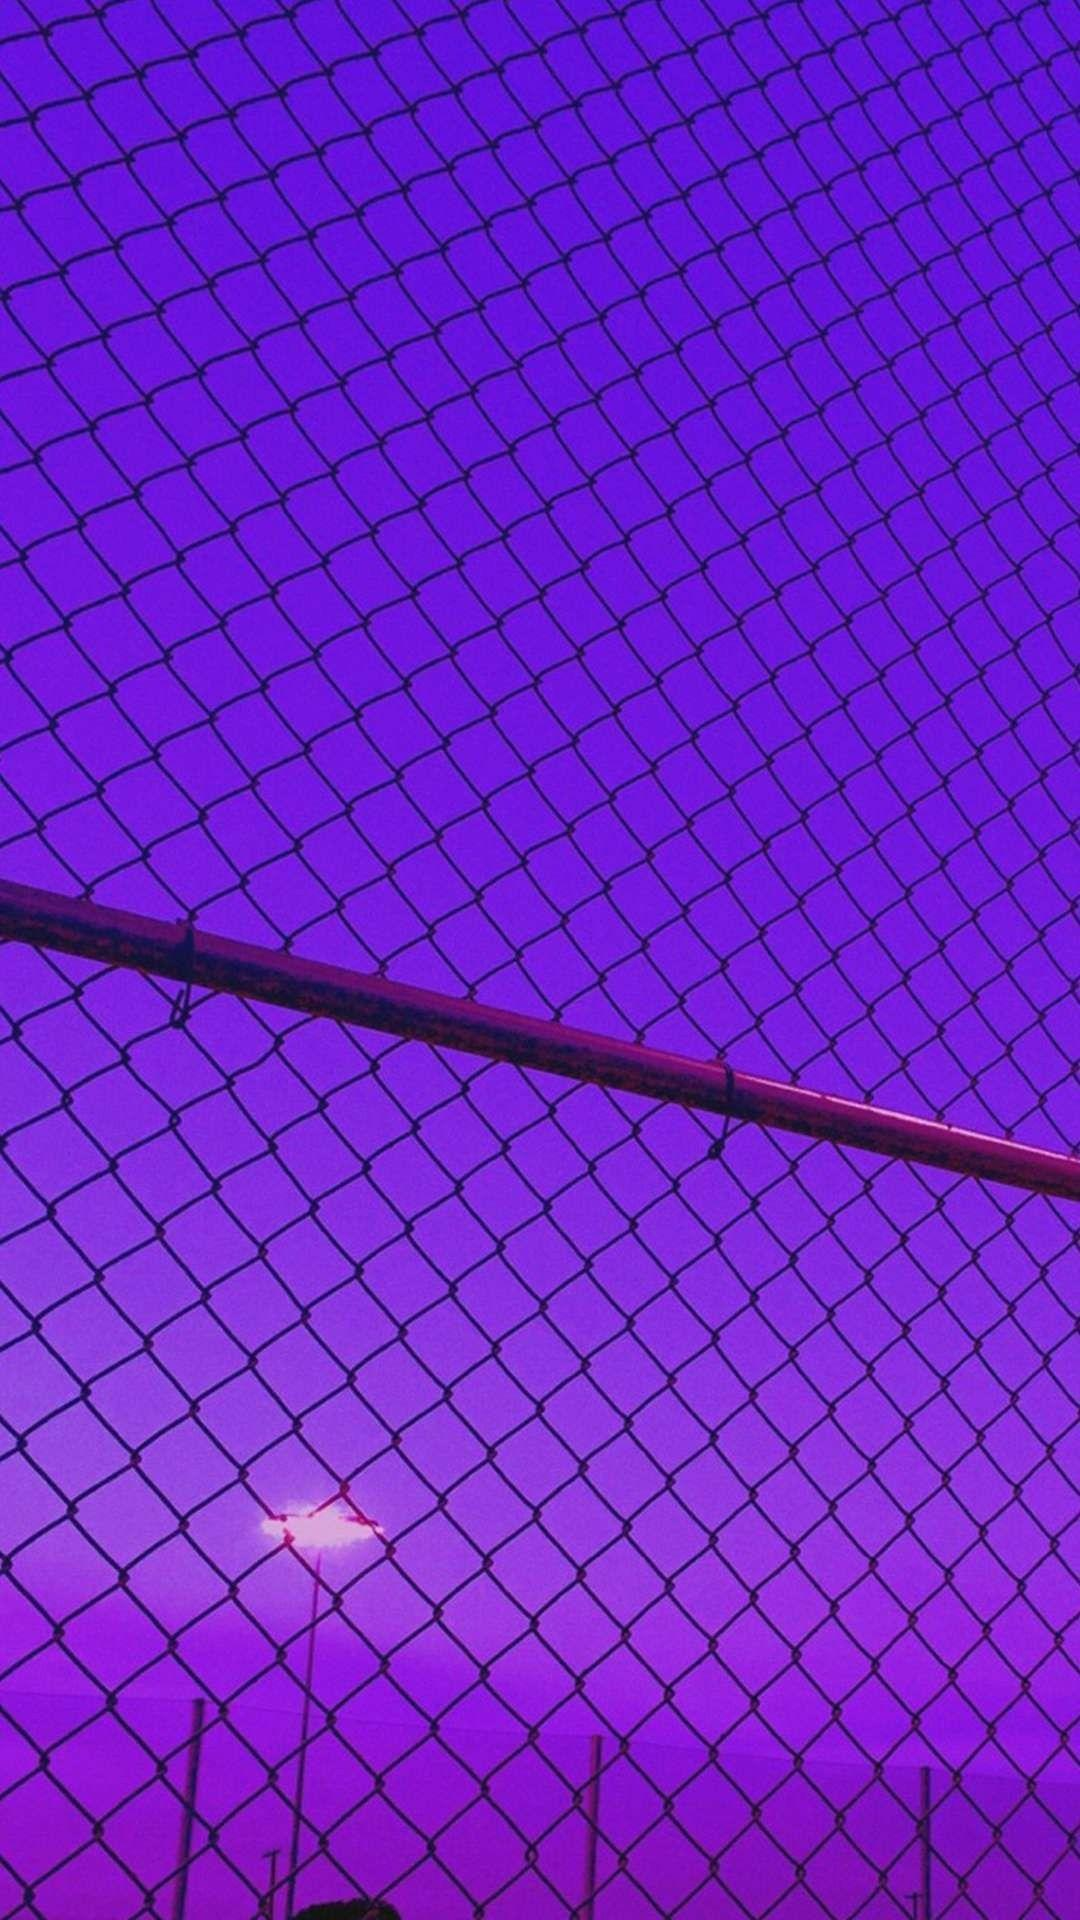 1080x1920 82+ purple phone wallpapers on wallpaperplay>. 4k Aesthetic Grunge Purple Wallpapers - Wallpaper Cave